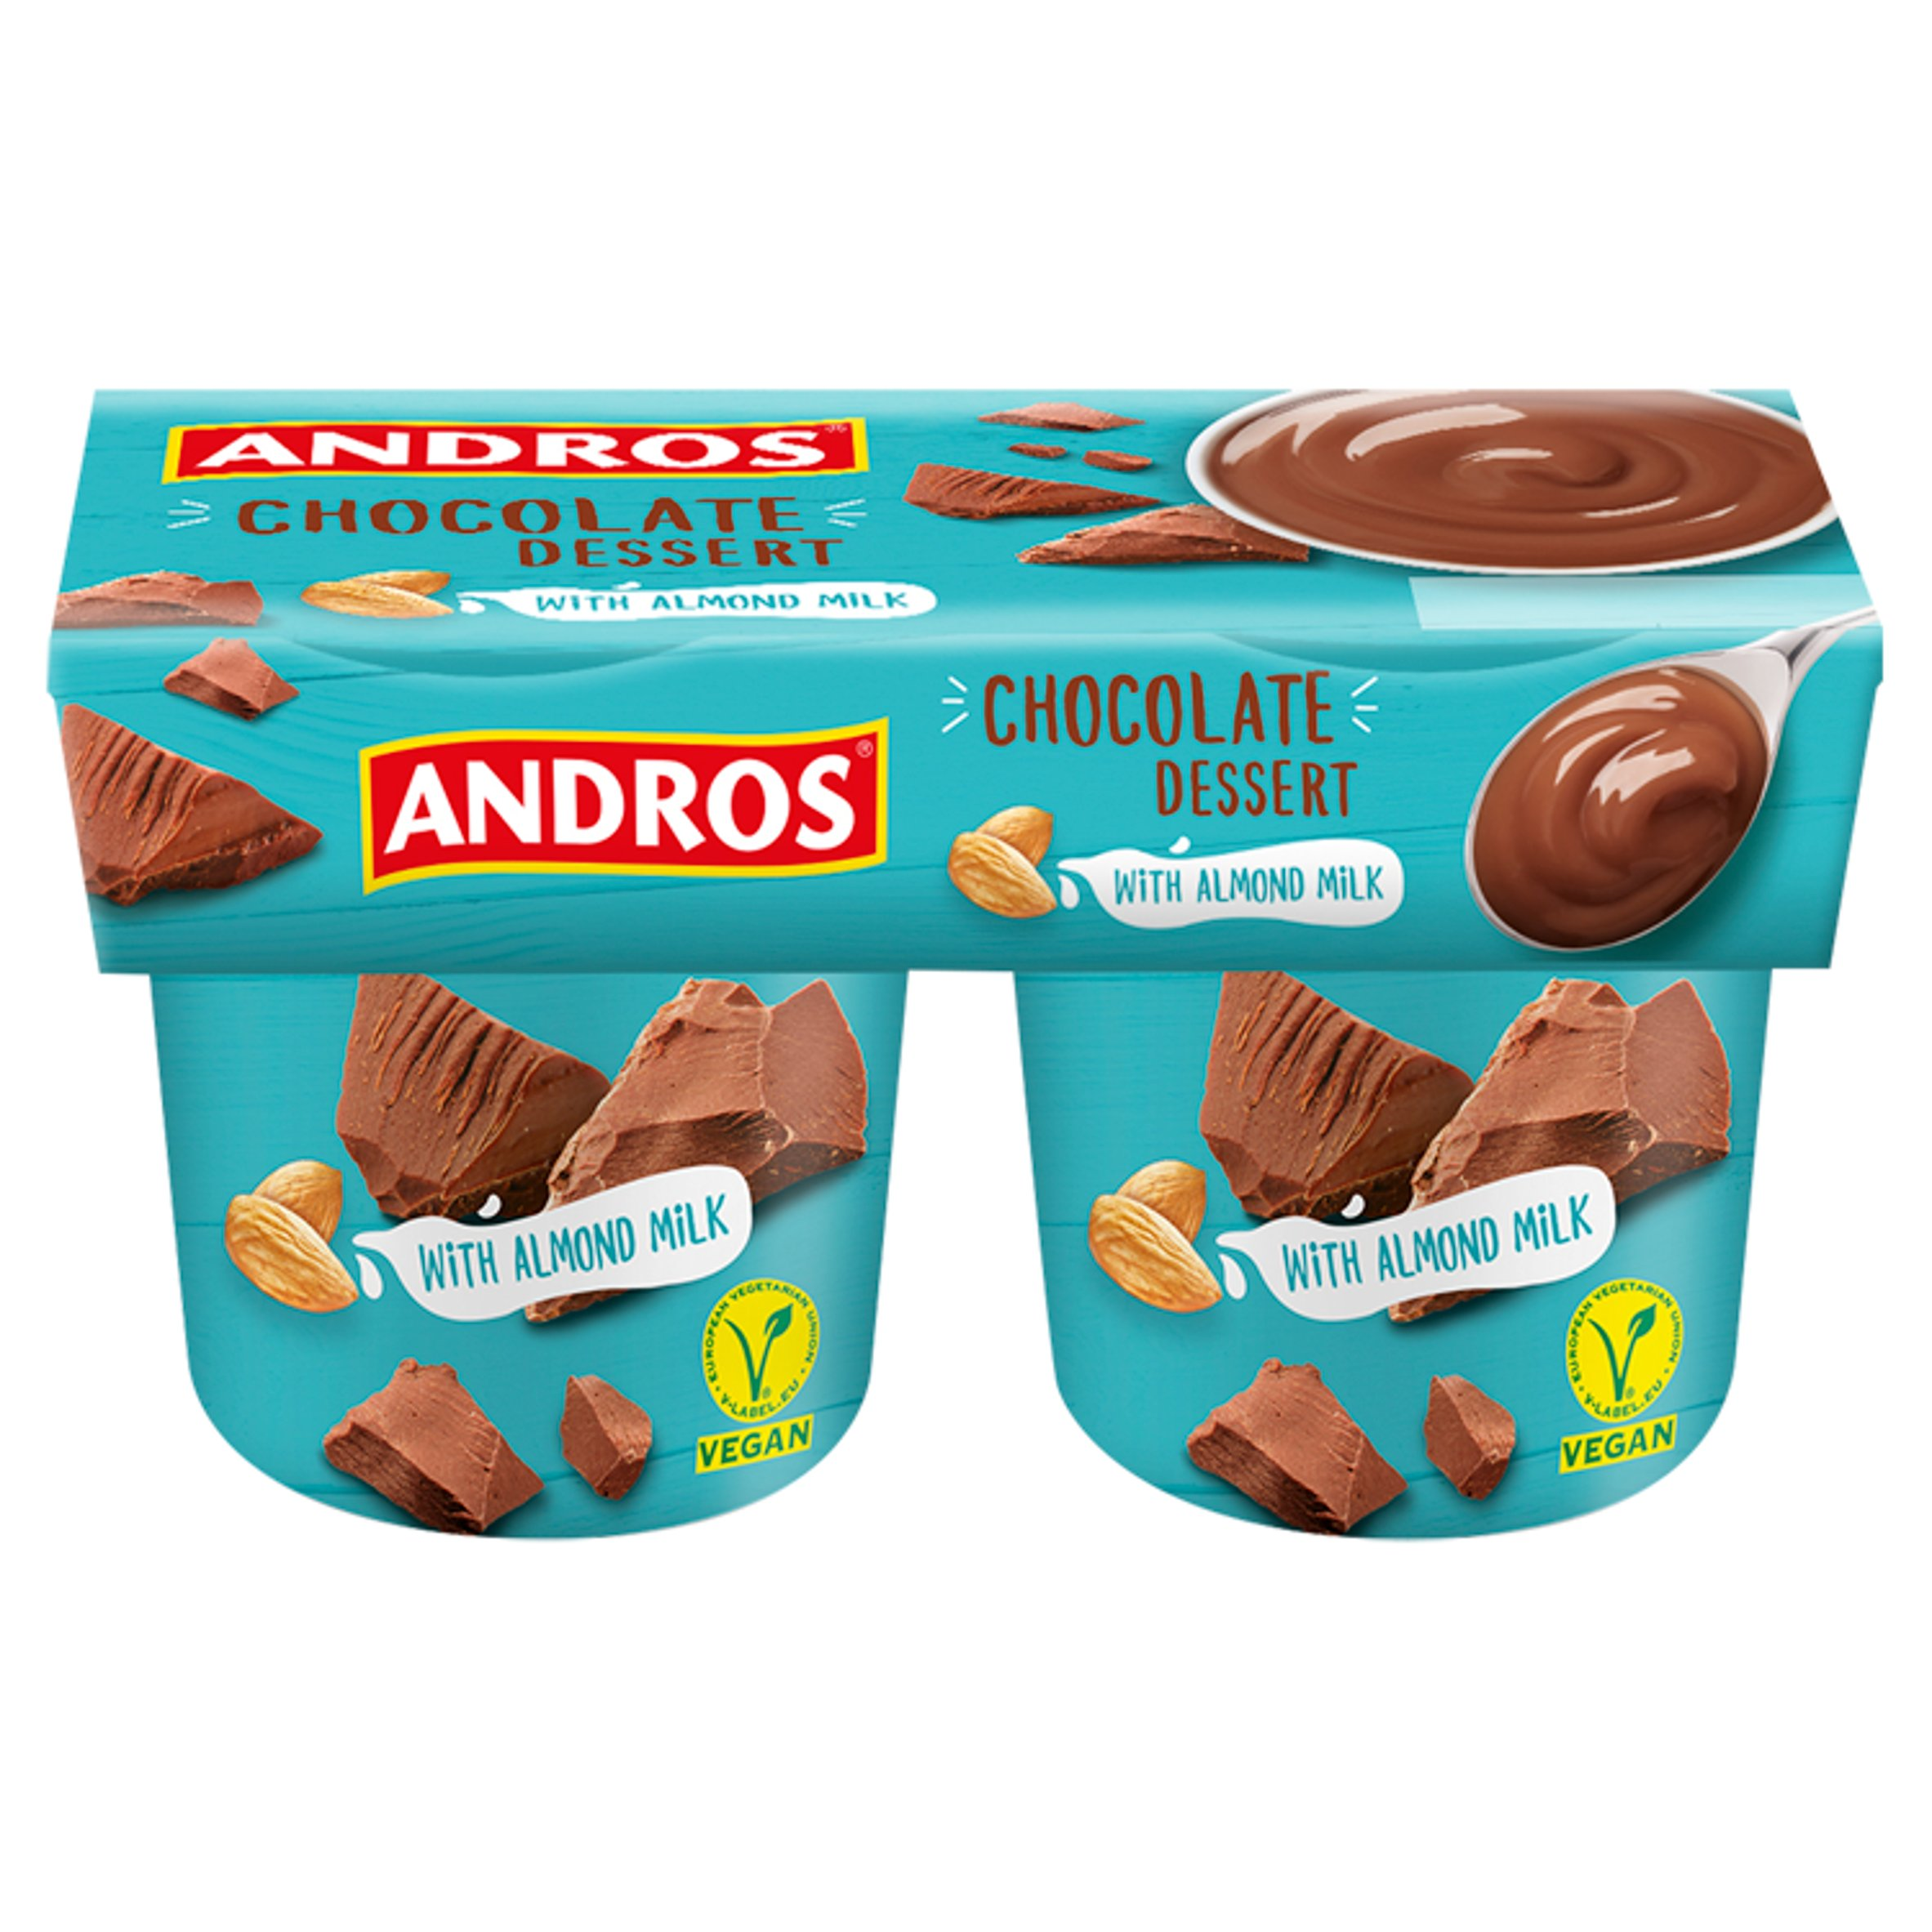 Andros Chocolate Dessert With Almond Milk 2 X 120G